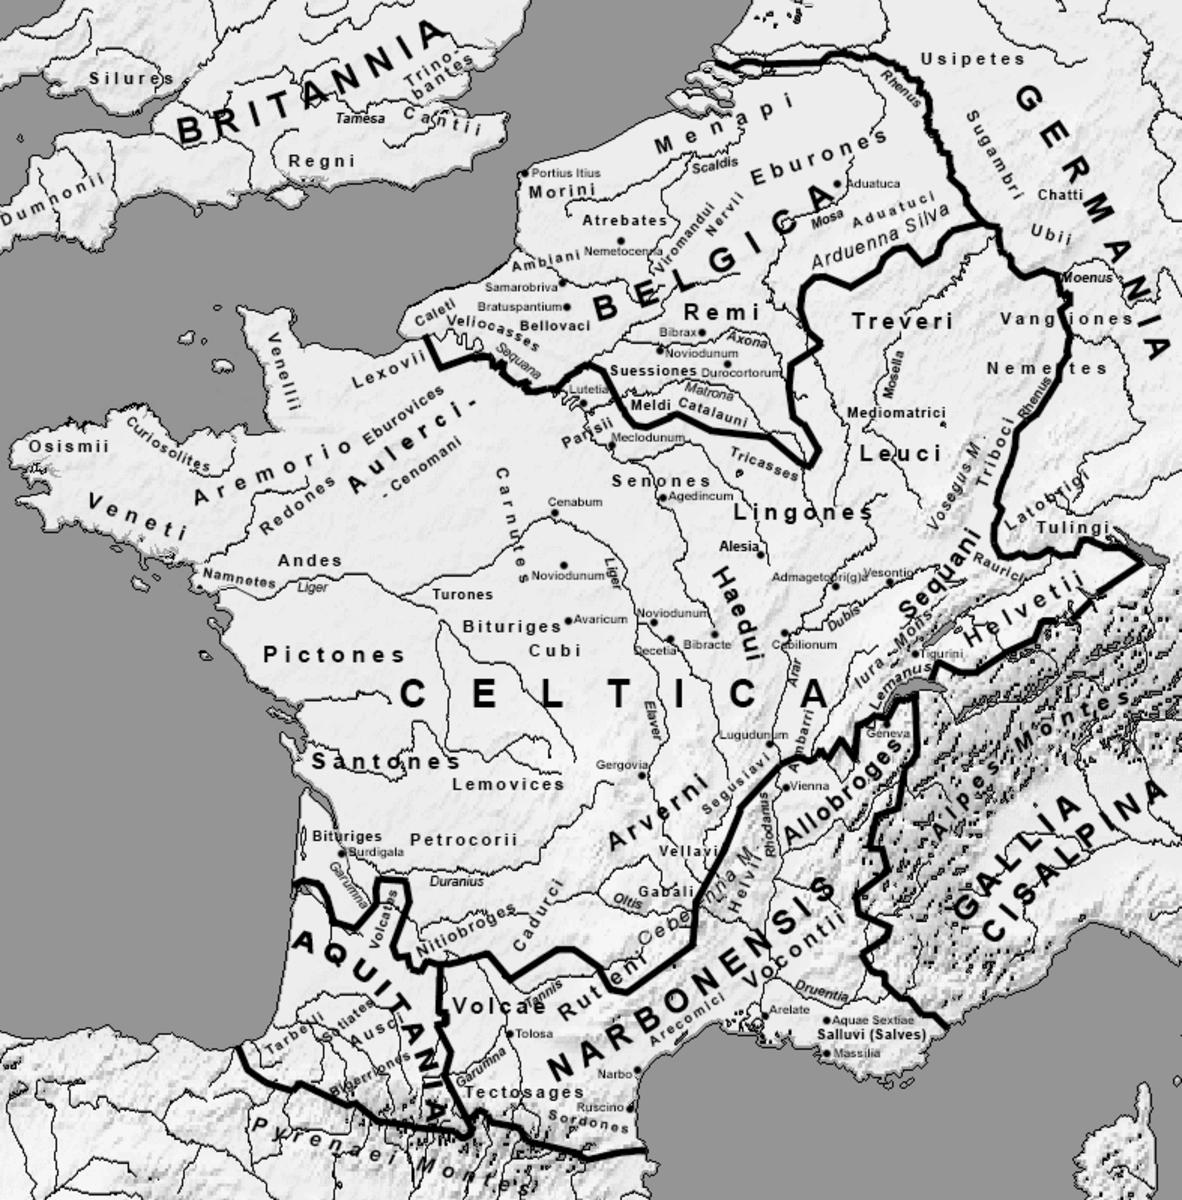 Roman map of Celtic territories in mainland Europe, circa 54 AD.